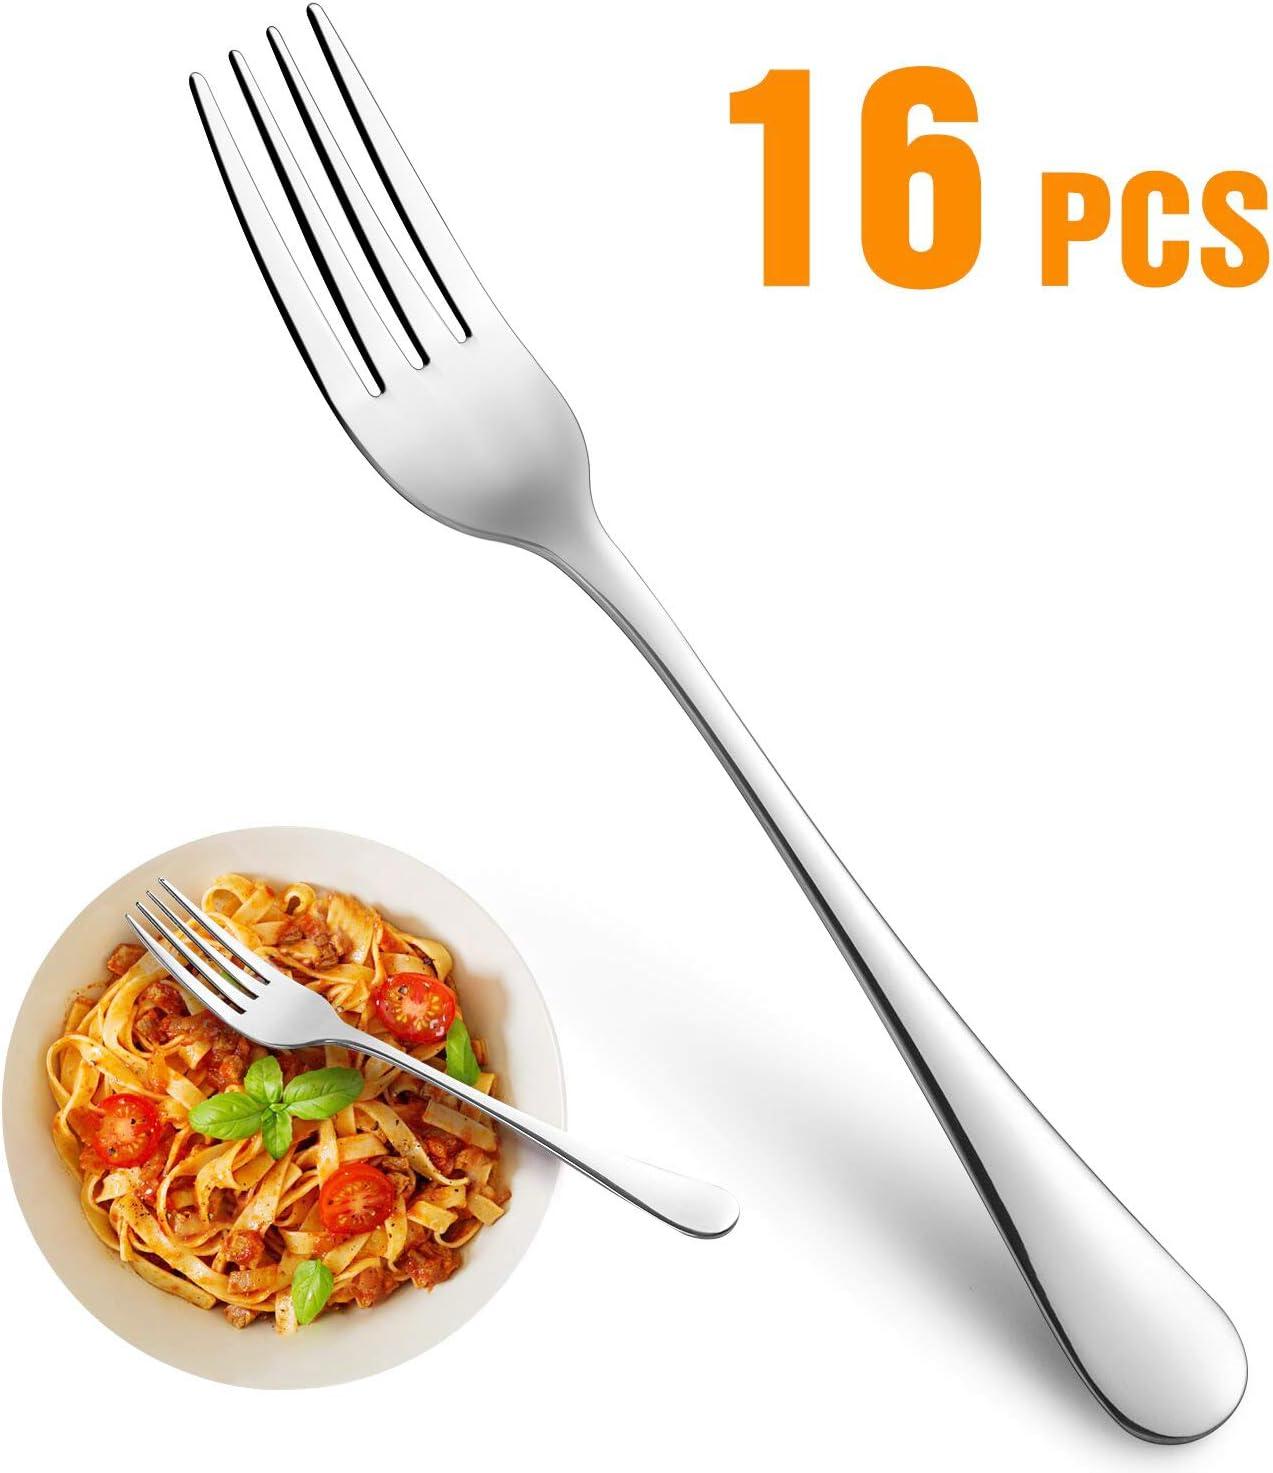 Dinner Forks,Set of 16 Top Food Grade Stainless Steel Silverware Forks,Table Forks,Flatware Forks,8 Inches,Mirror Finish & Dishwasher Safe,Use for Home,Kitchen or Restaurant